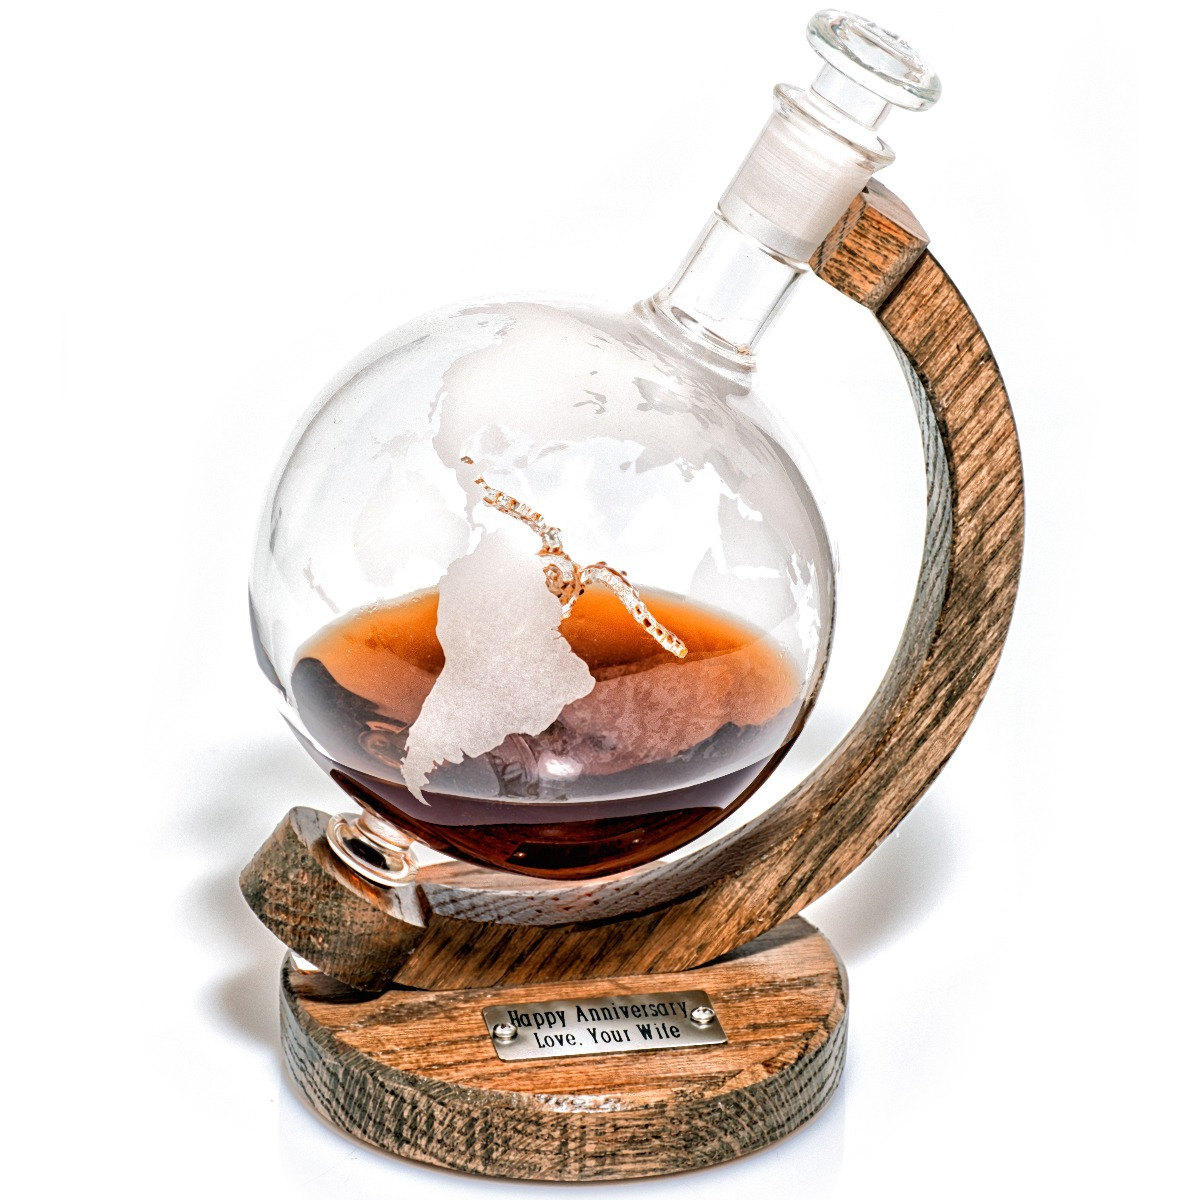 Engraved globe duck whiskey decanter